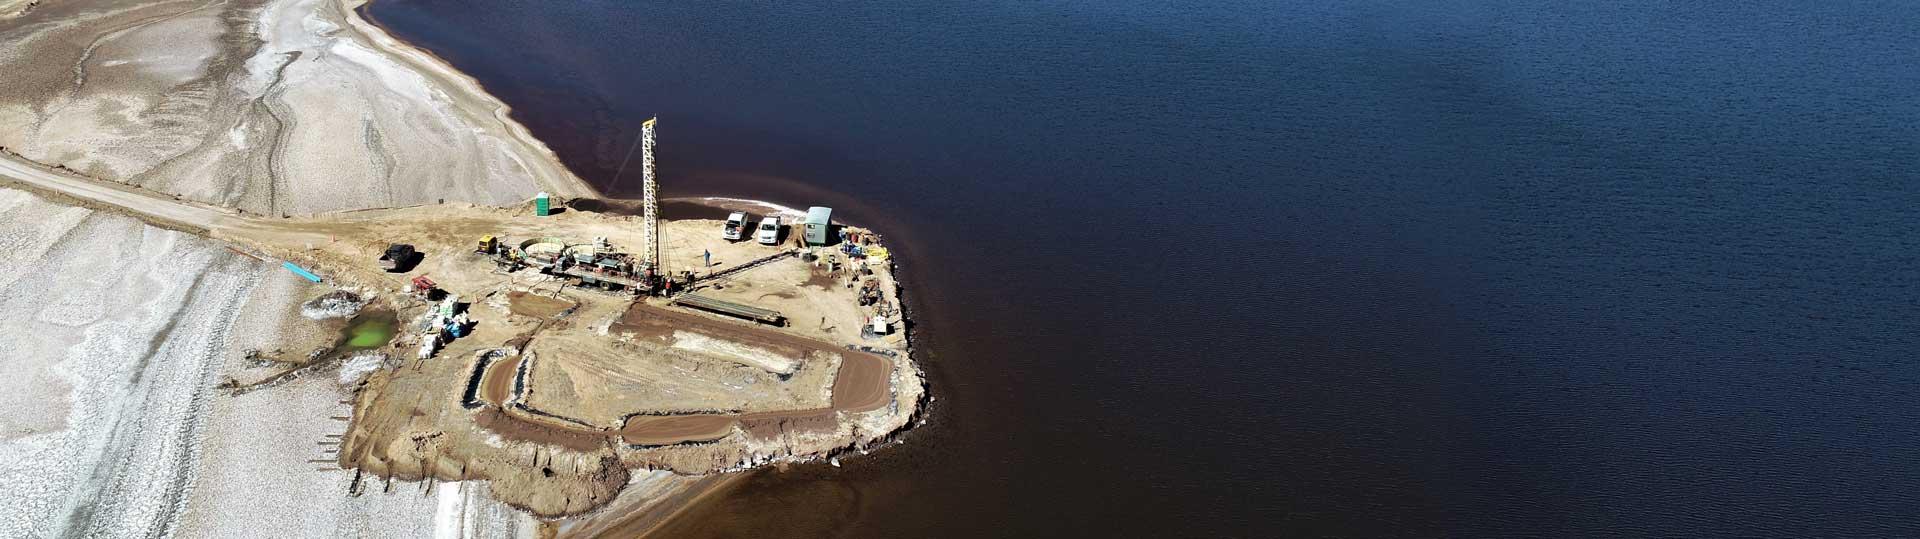 3Q project aerial shot